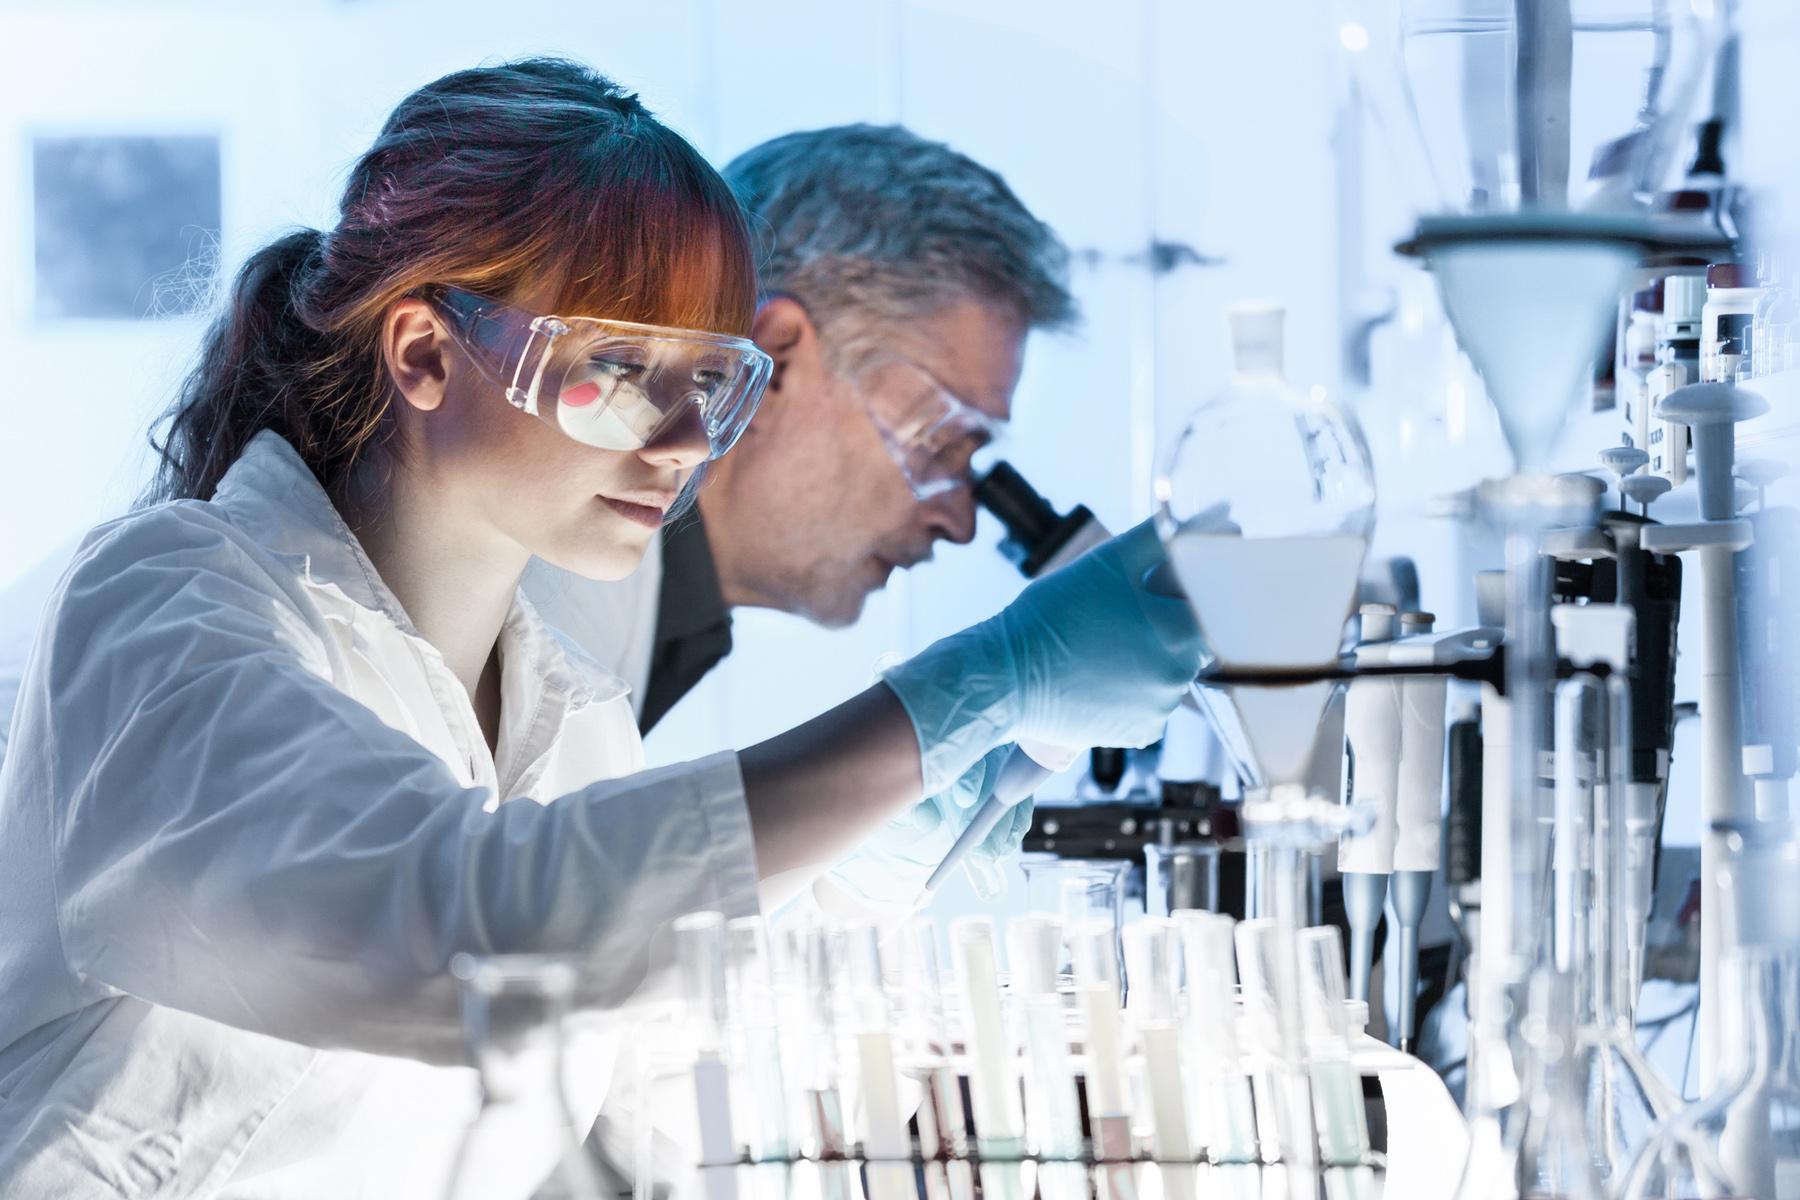 Scientific researchers